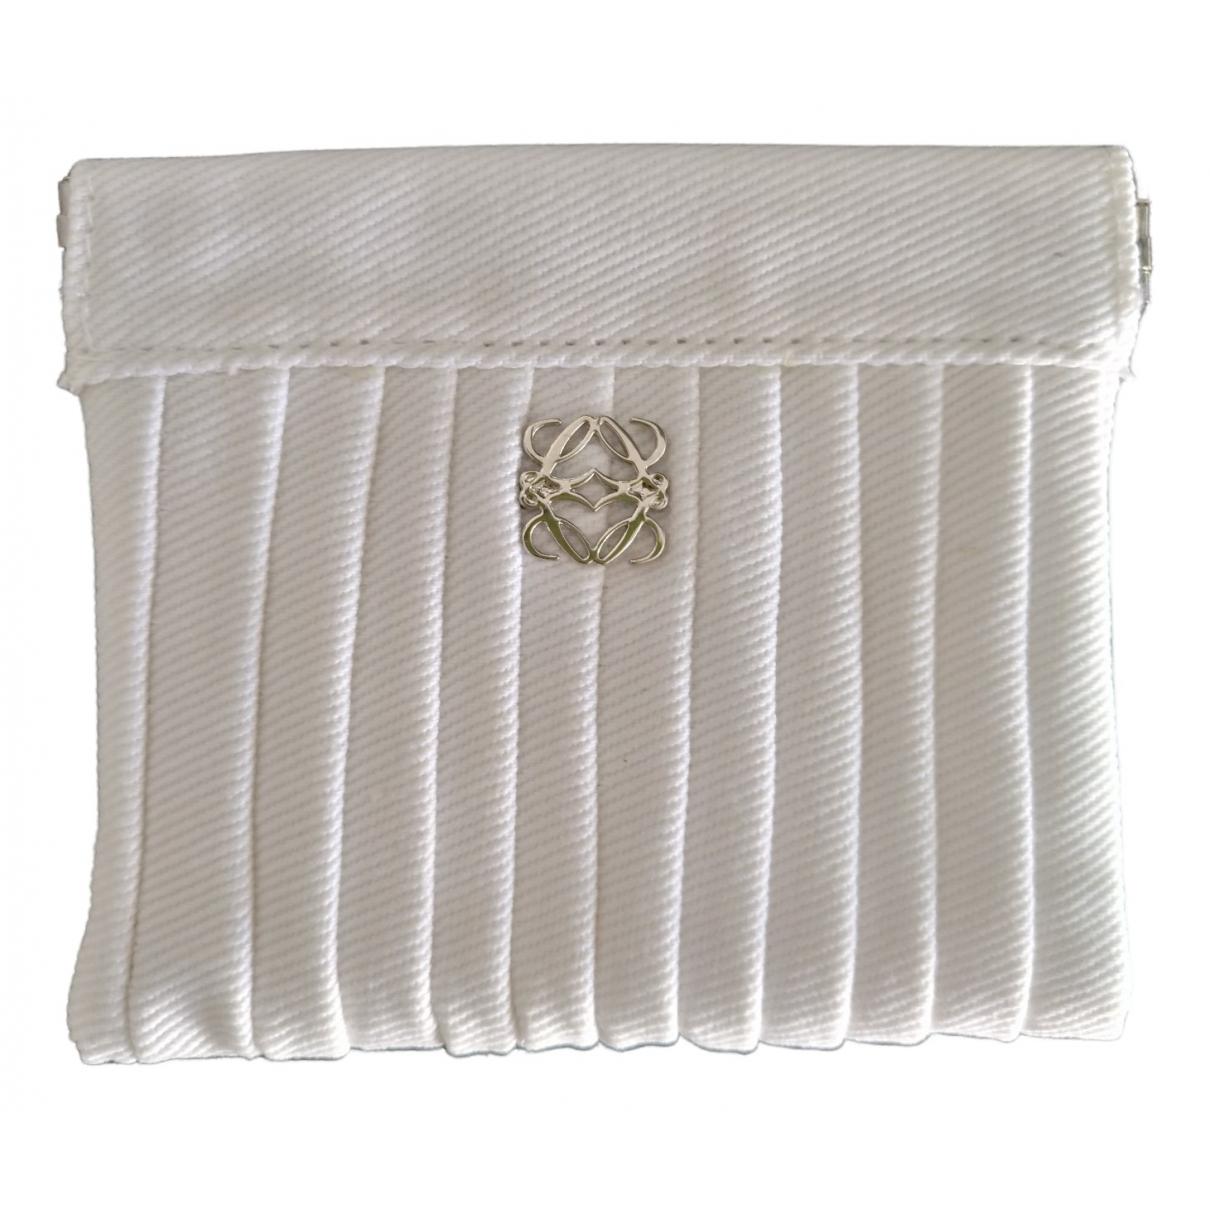 Loewe \N White Cotton Purses, wallet & cases for Women \N